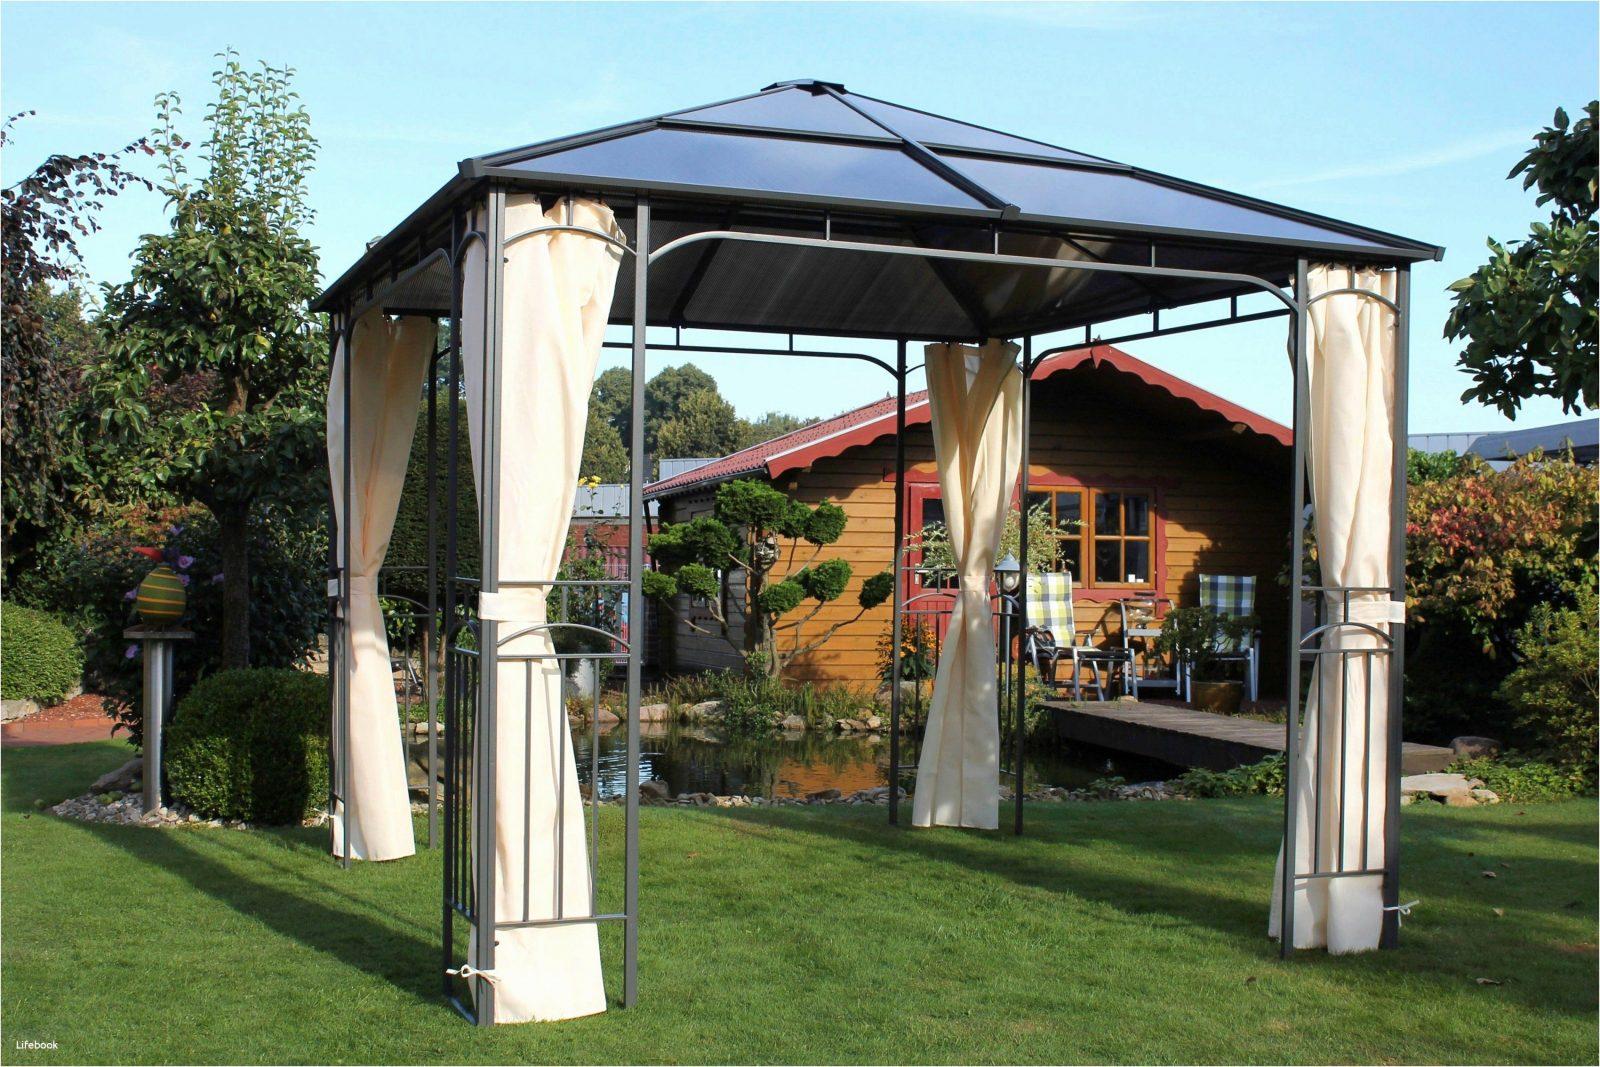 Ersatzdach Pavillon 3×3 Ikea Frisch – Litebook von Ersatzdach Pavillon 4X4 Wasserdicht Bild